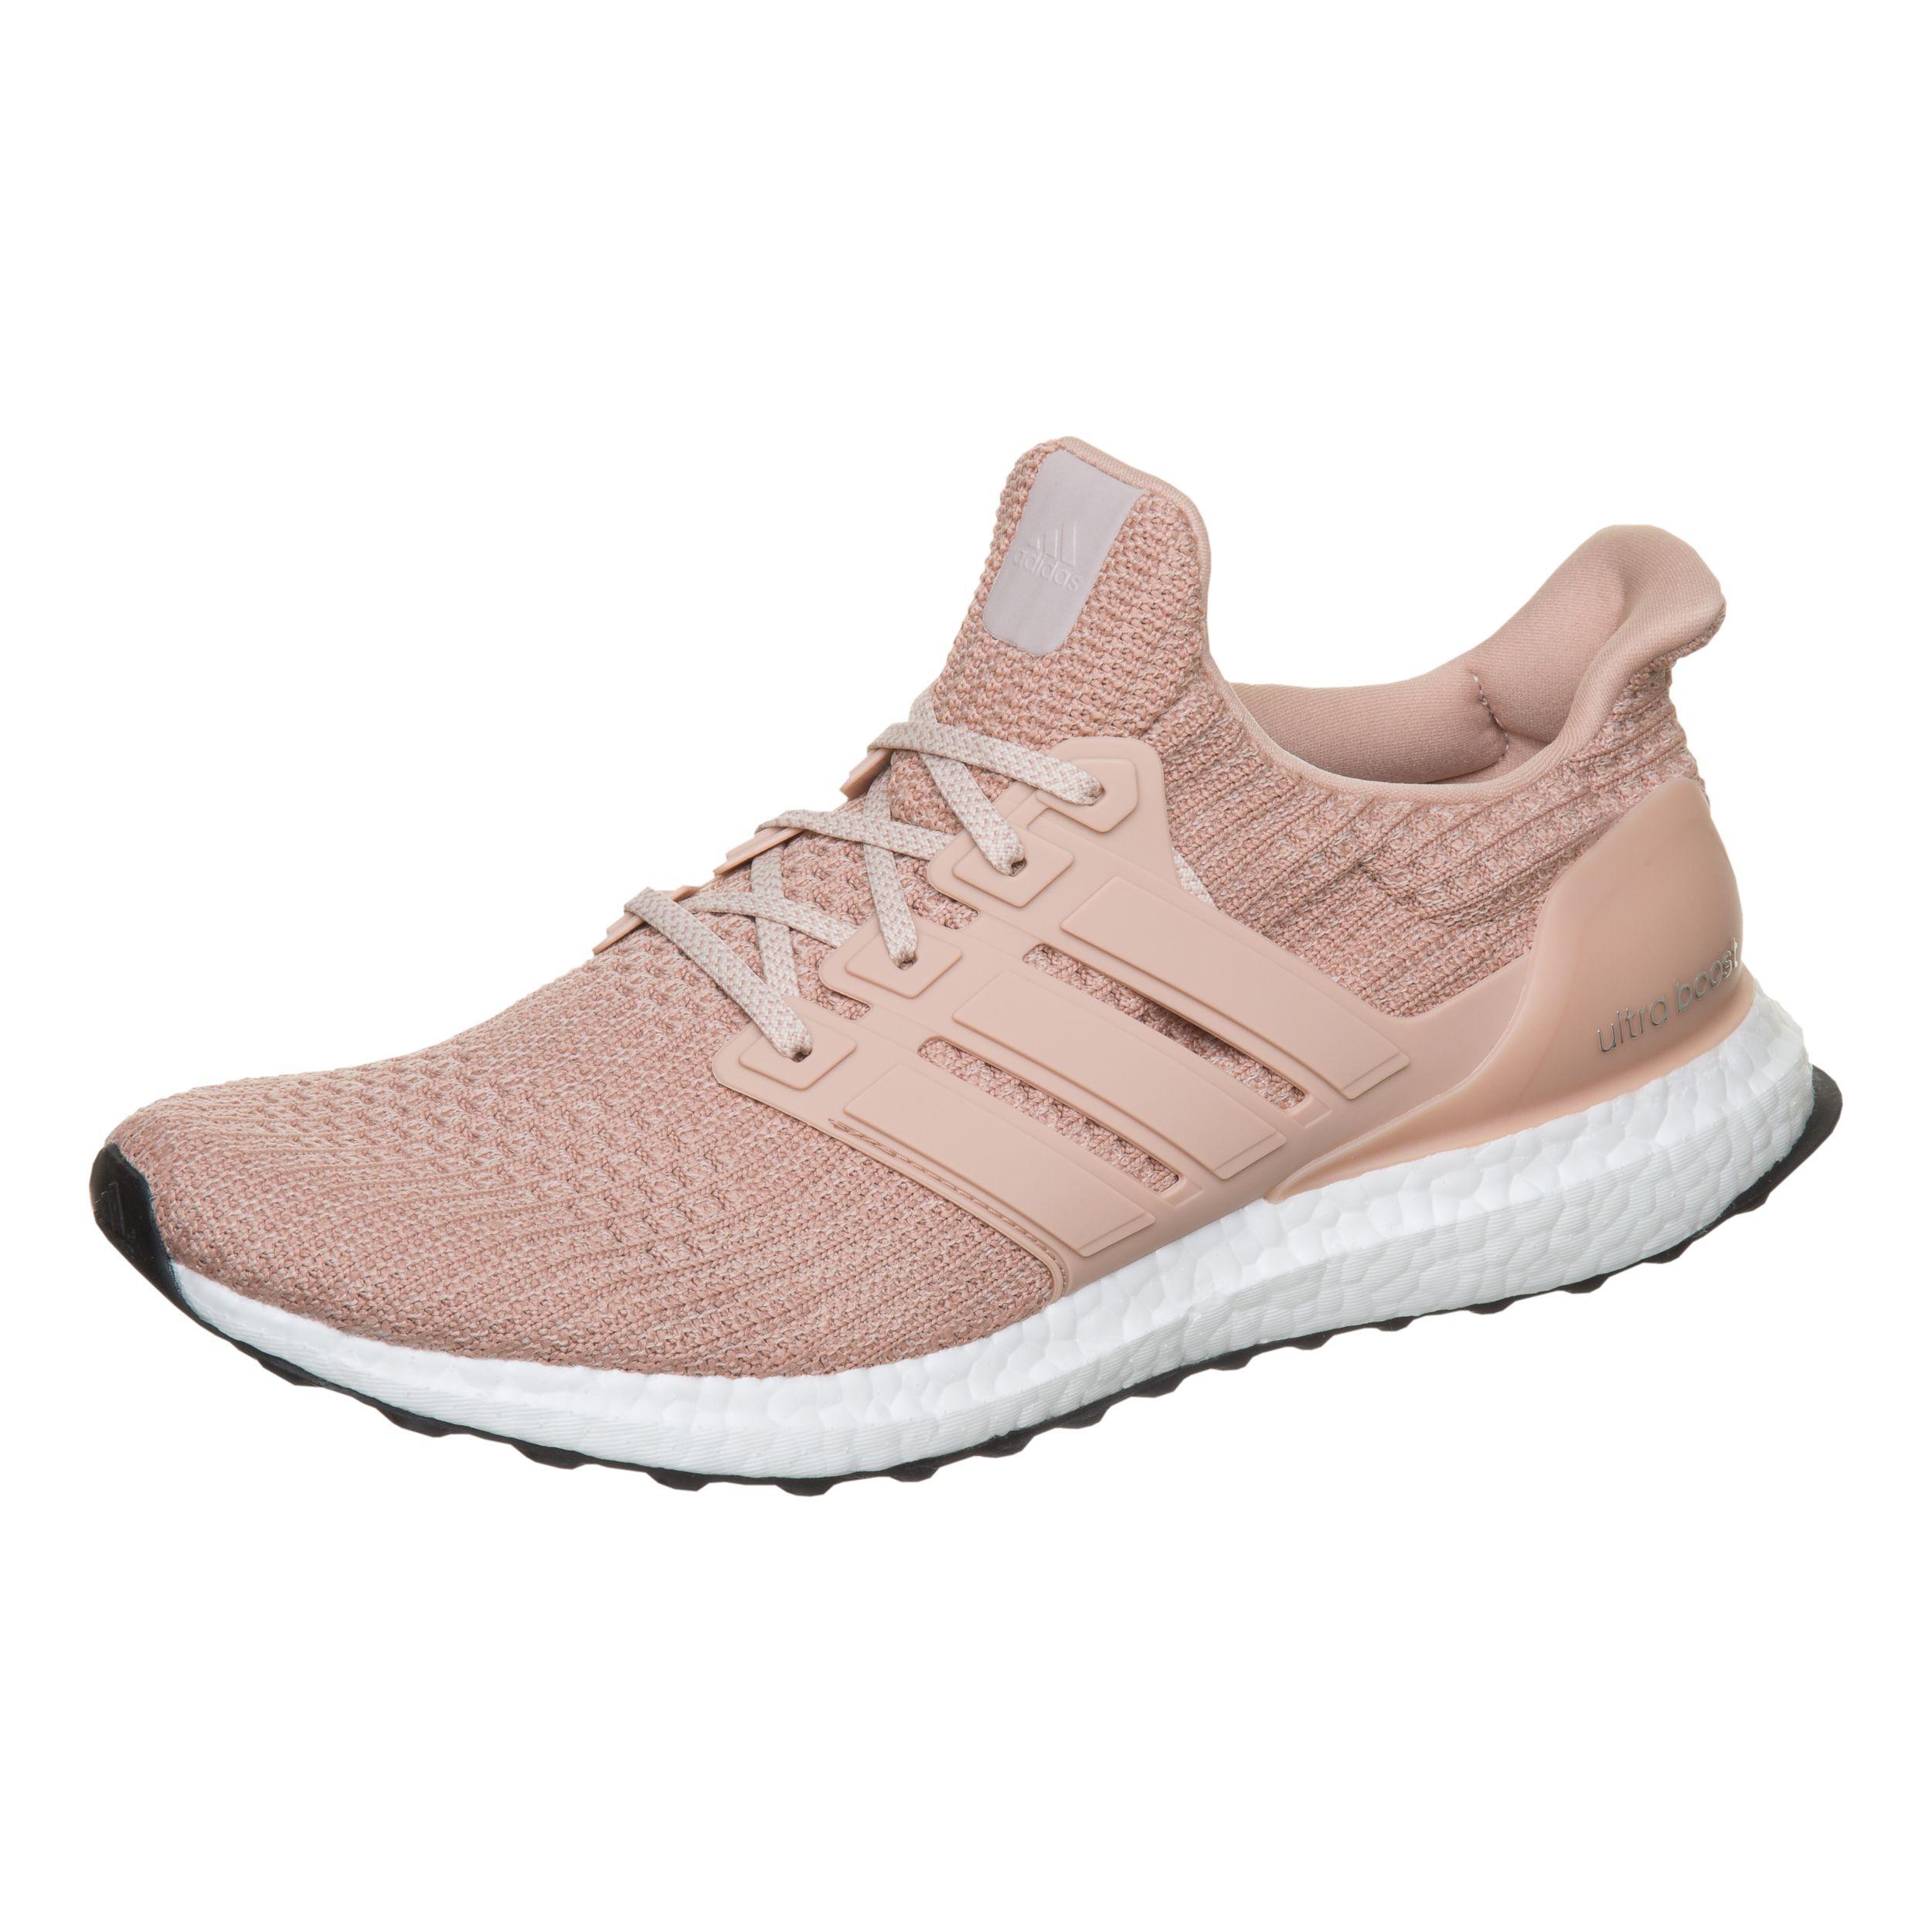 RosaWeiß Online Adidas Ultra Boost Kaufen Neutralschuh Damen gYb6yf7v